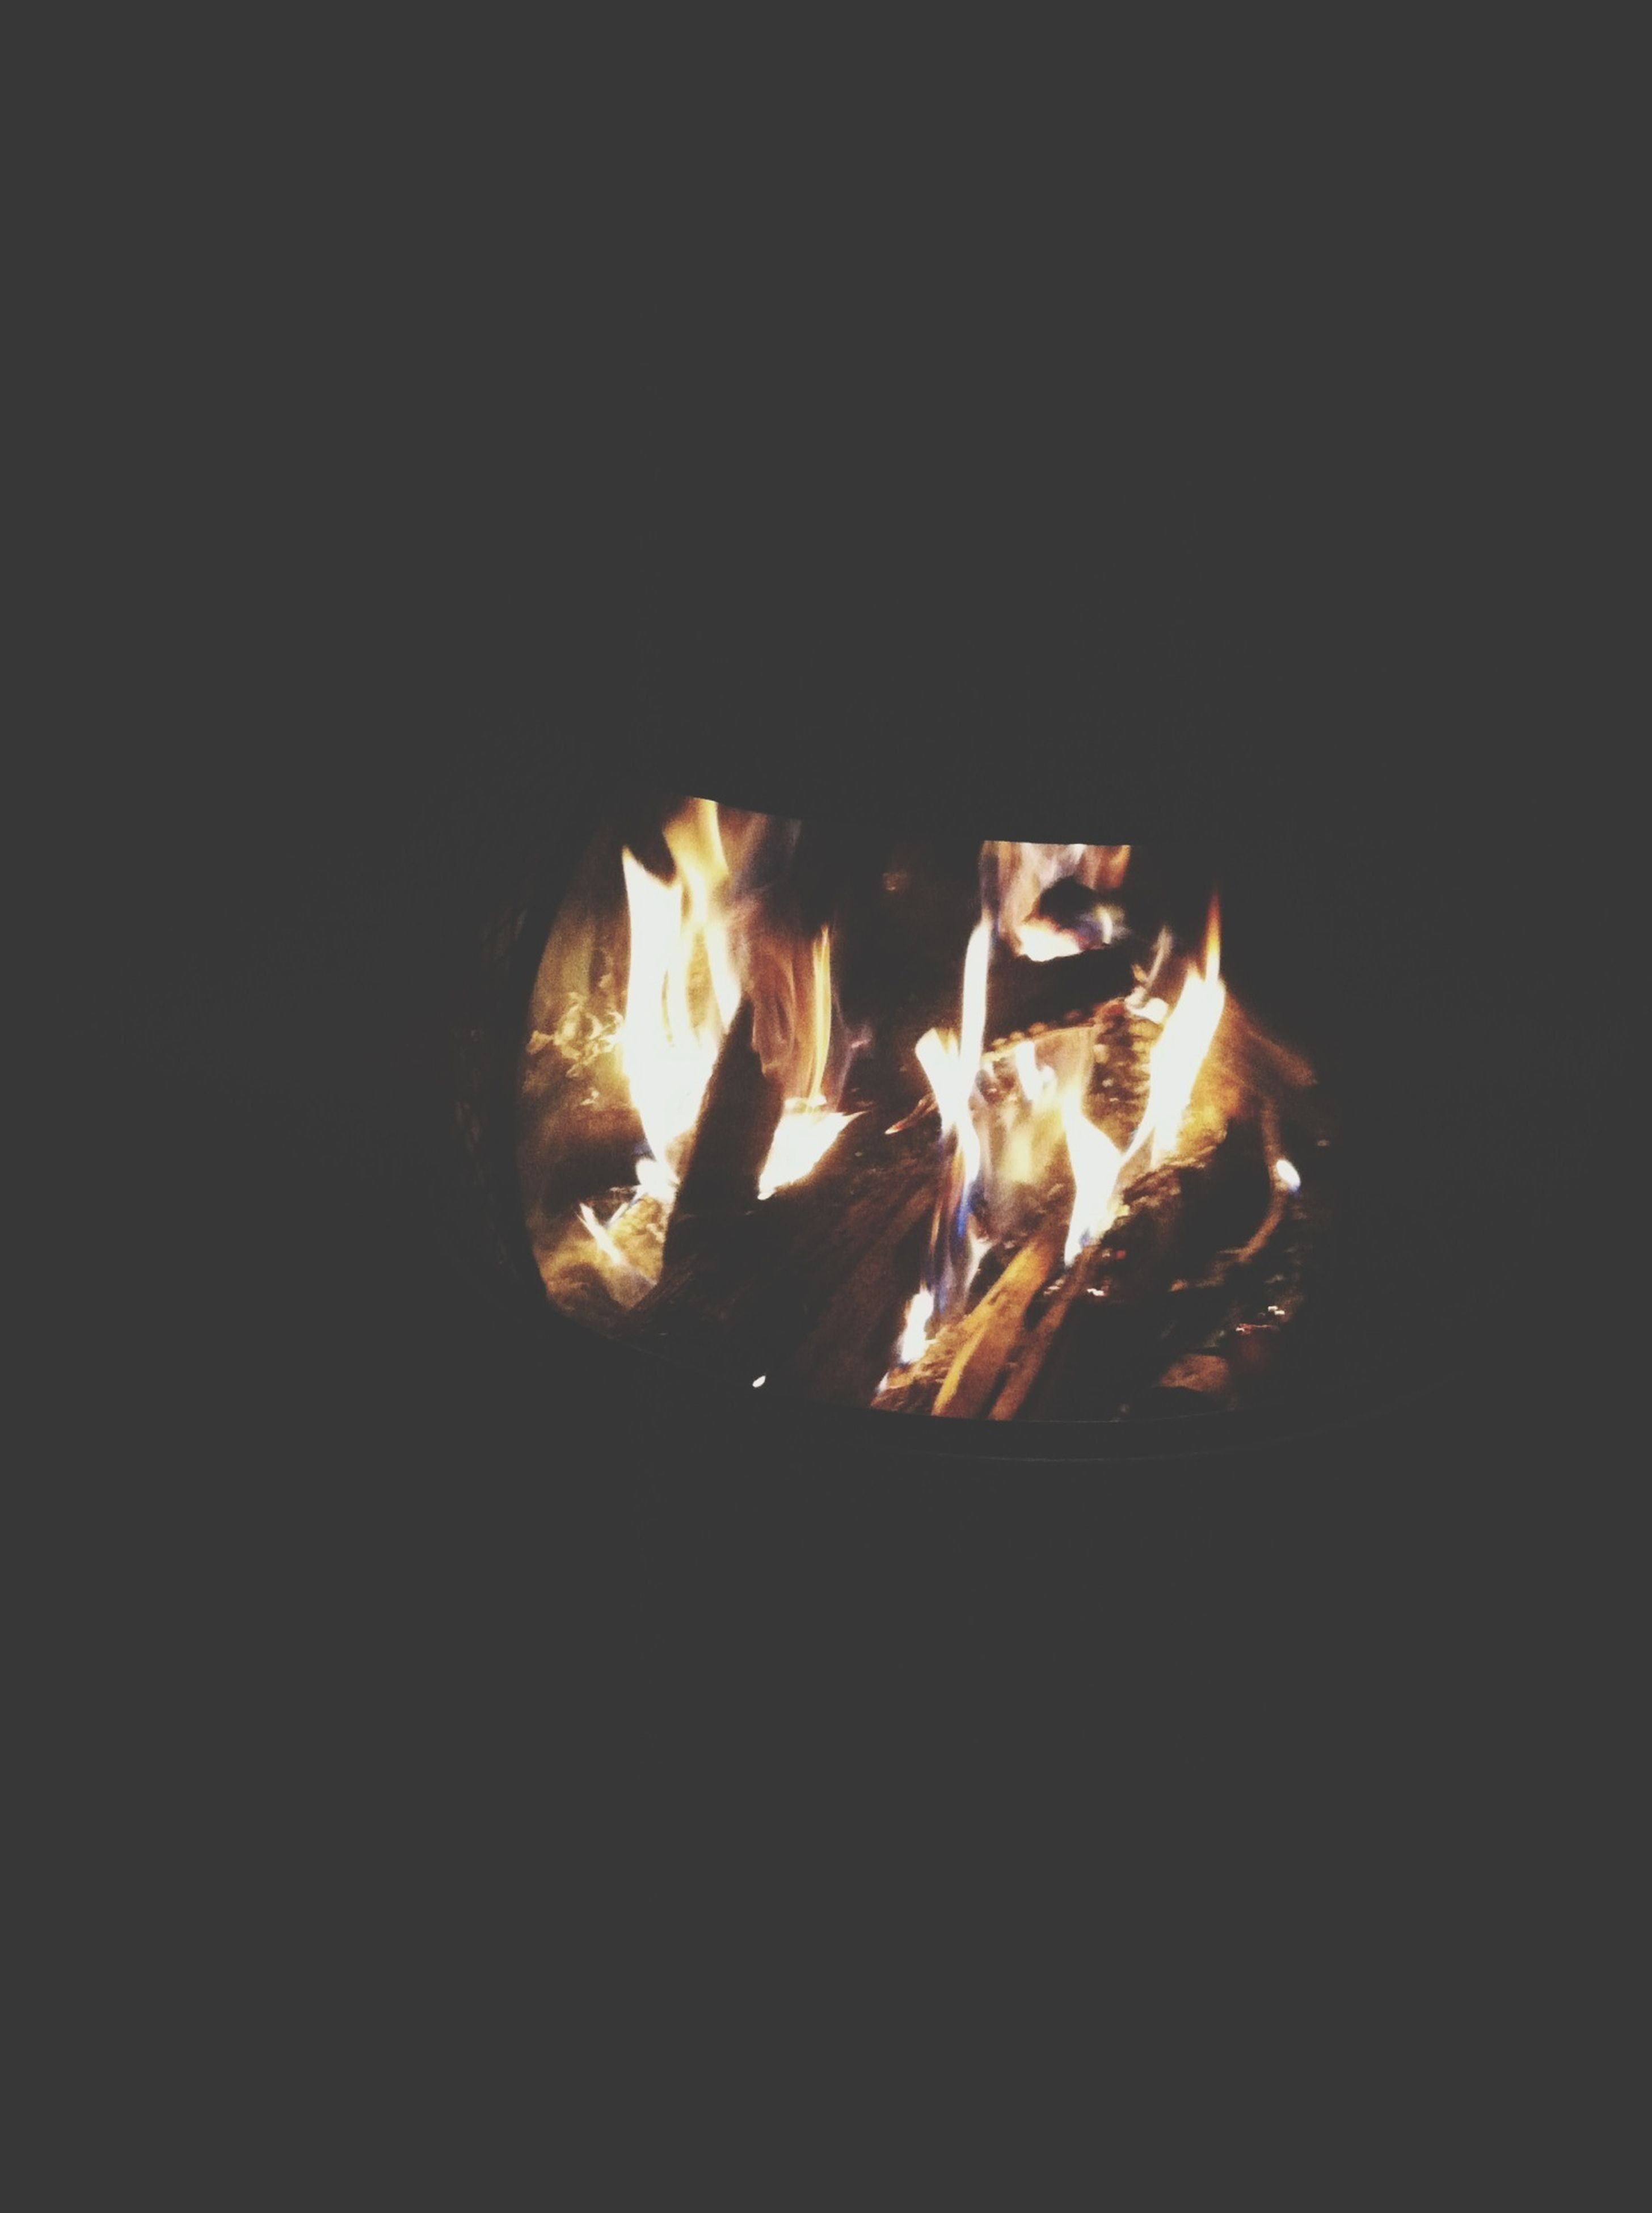 flame, burning, heat - temperature, fire - natural phenomenon, glowing, night, bonfire, firewood, fire, dark, heat, close-up, campfire, orange color, copy space, illuminated, no people, wood - material, light - natural phenomenon, motion